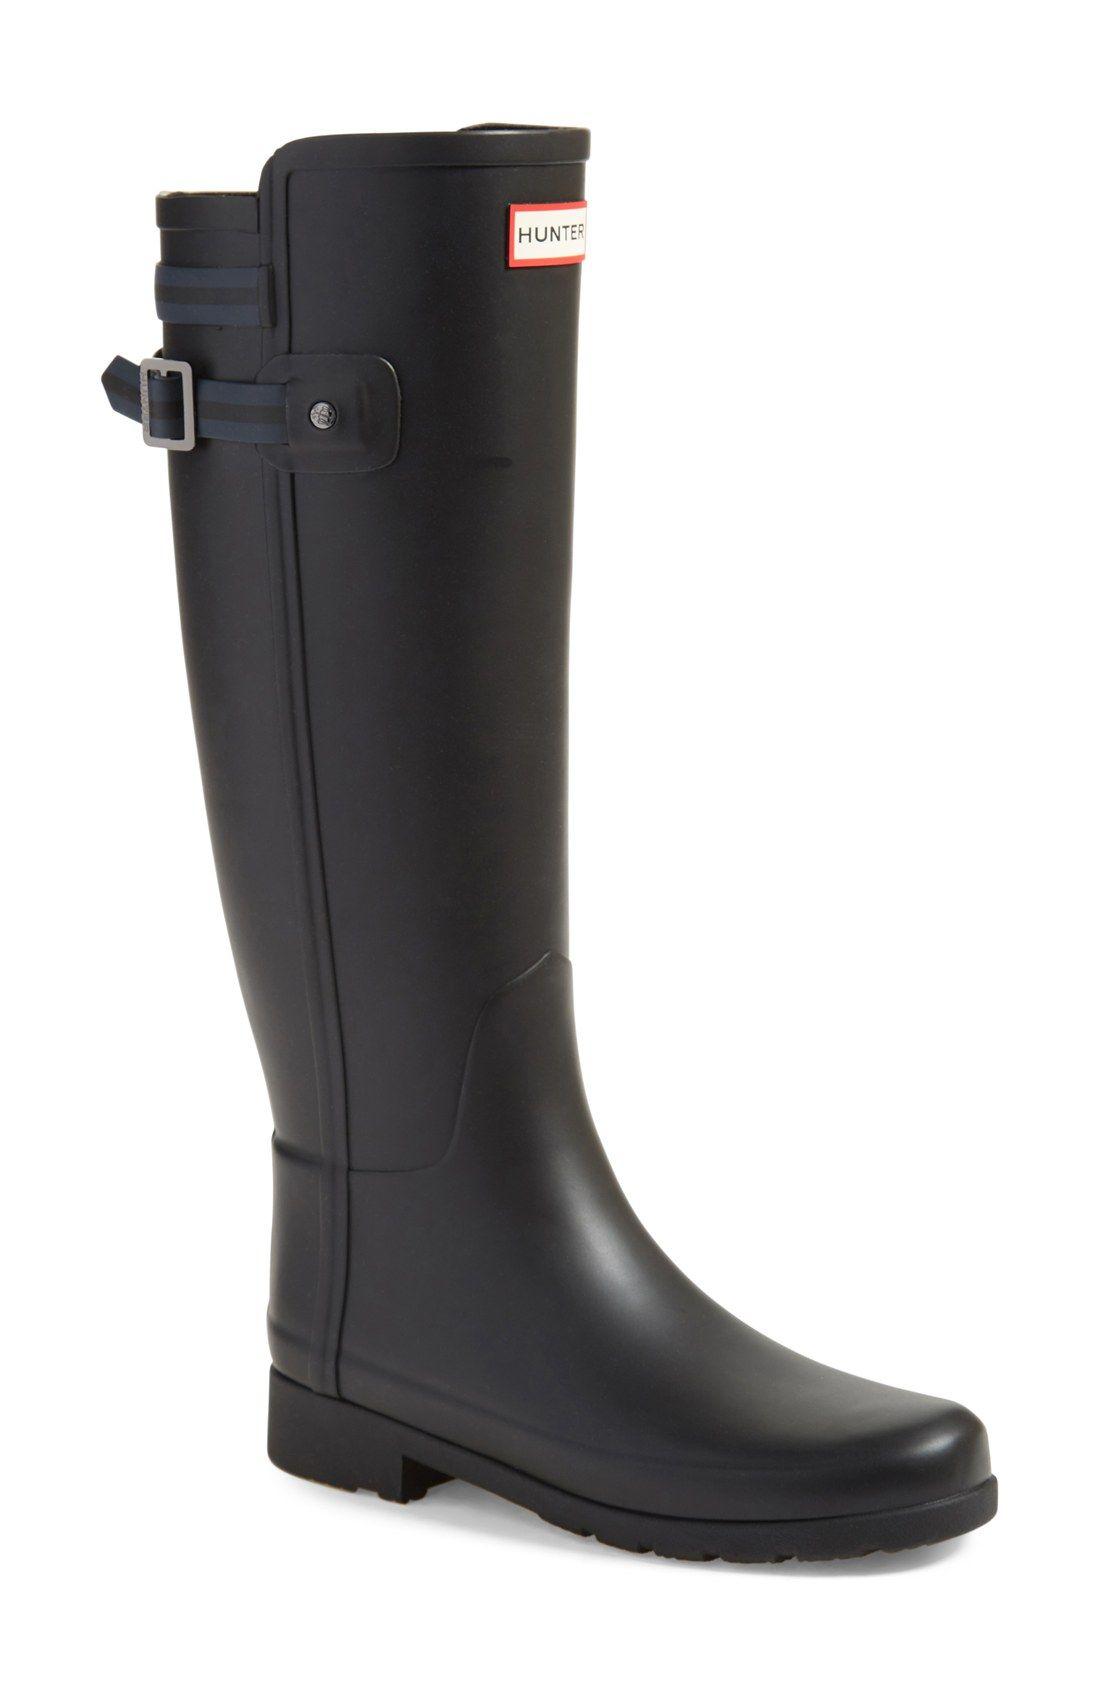 nordstrom anniversary sale | hunter boots | www.jasmineelias.com ...